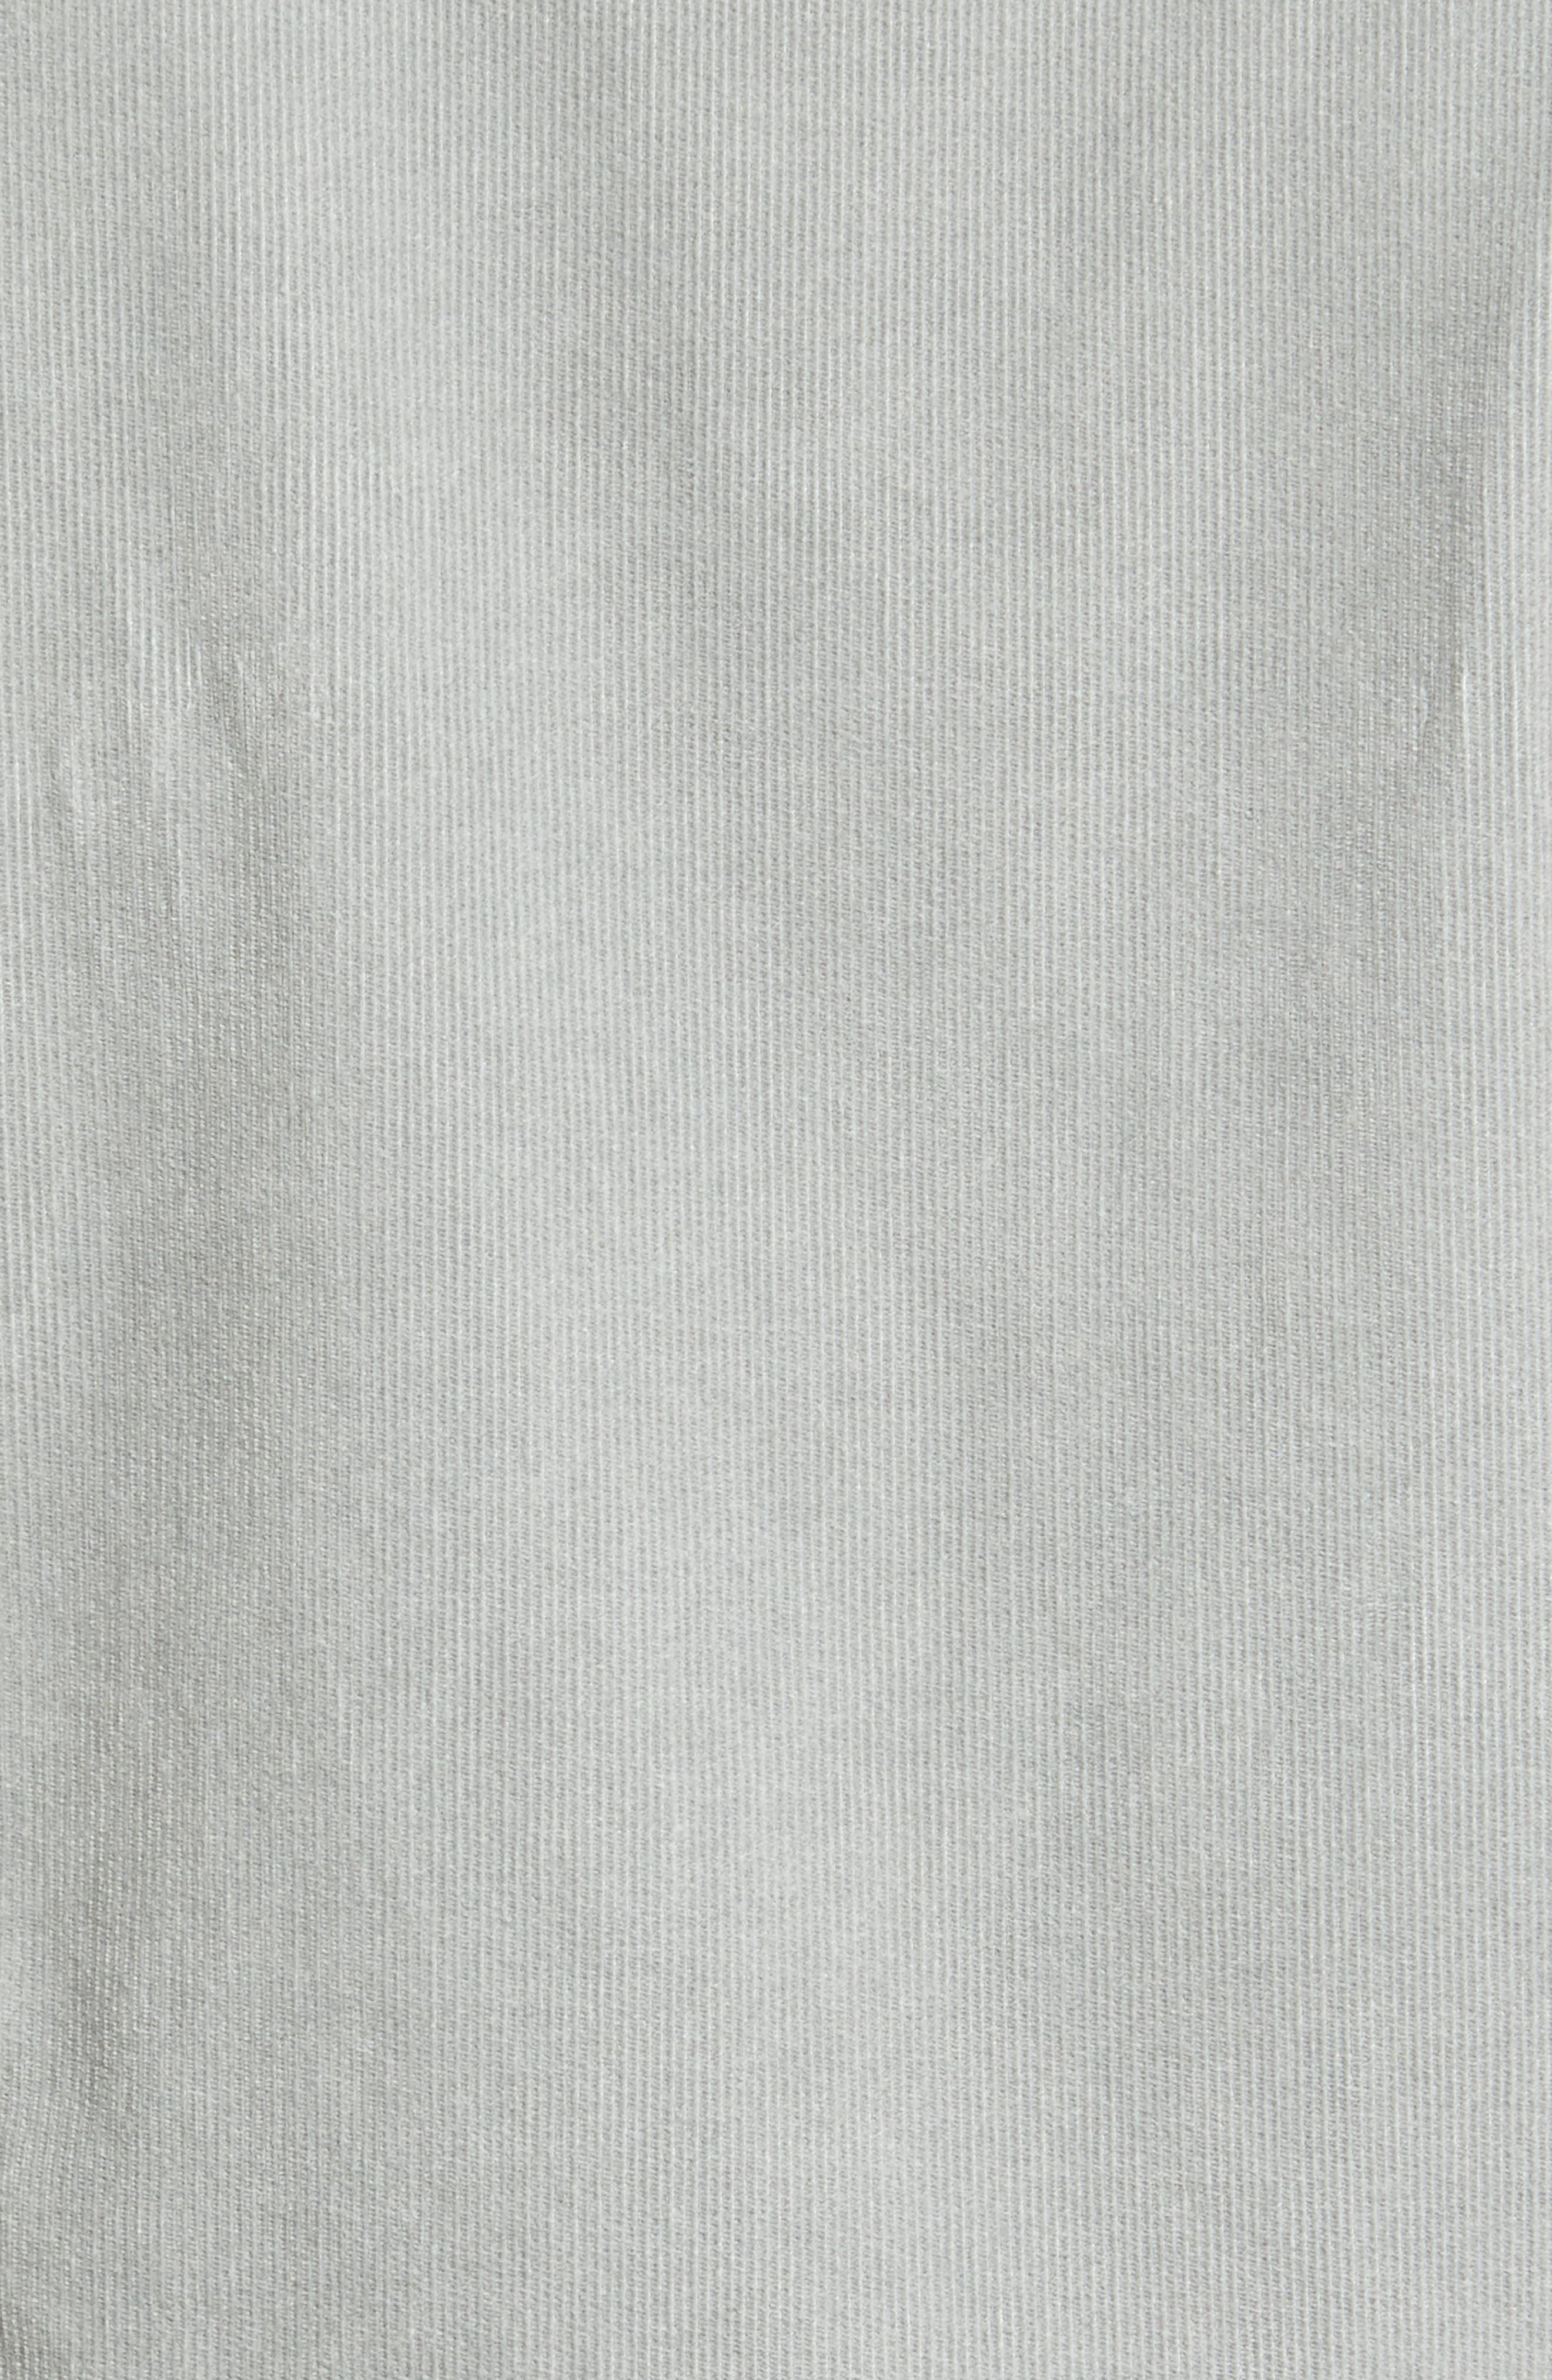 Pigment Dyed Stretch Corduroy Jacket,                             Alternate thumbnail 6, color,